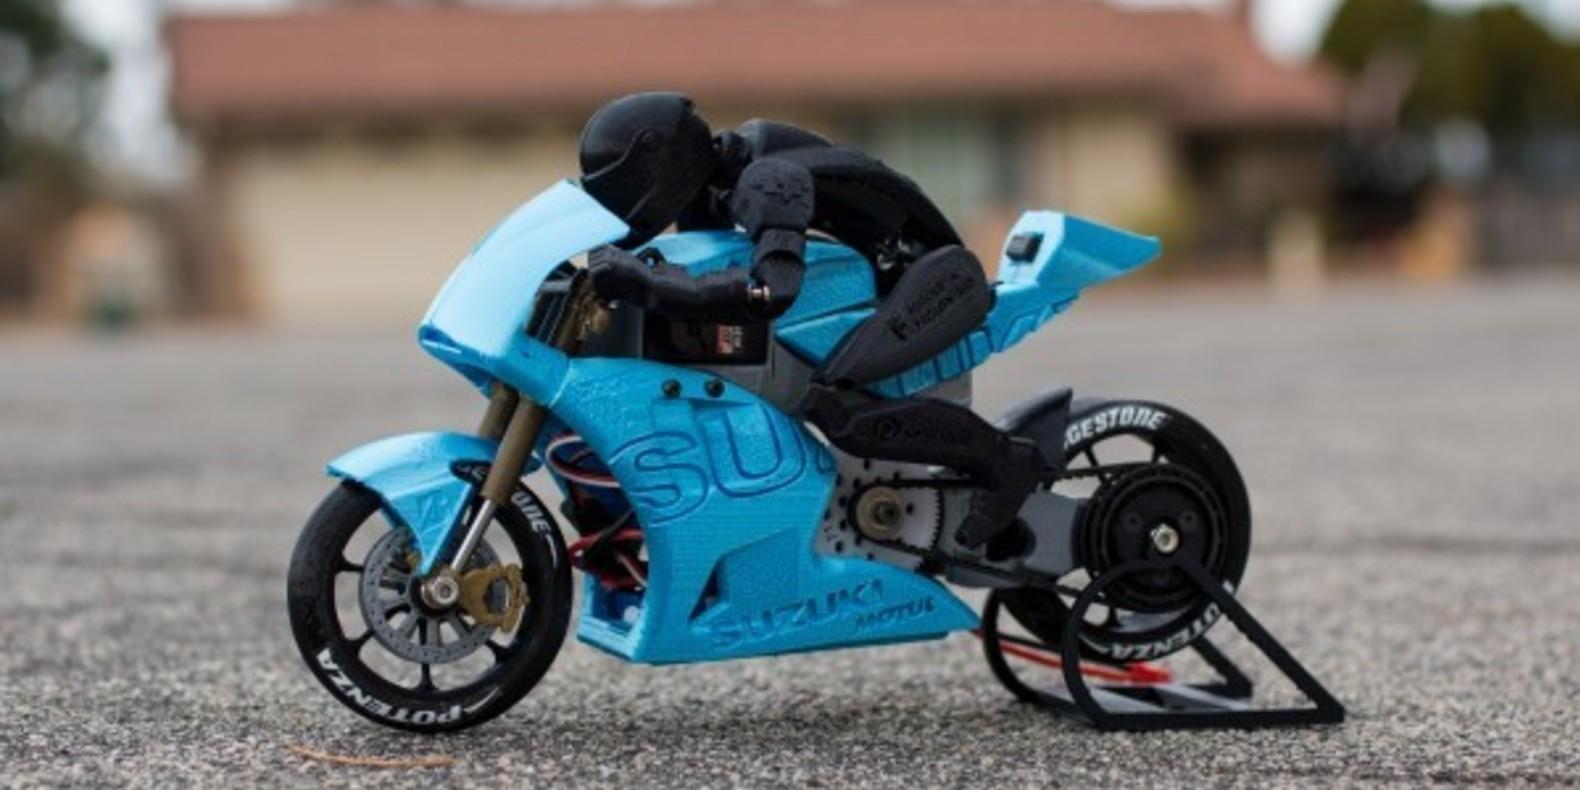 brett-3D-model-moto-télécommandée-cults-1.jpg